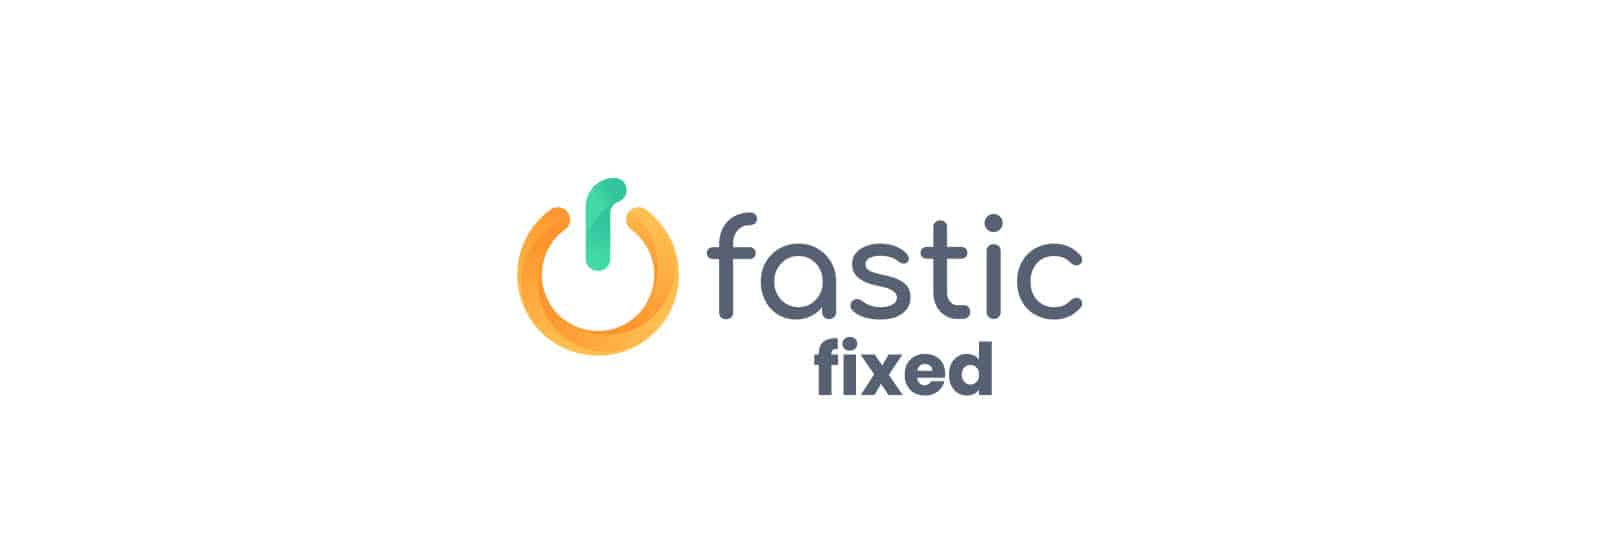 fastic-fixed